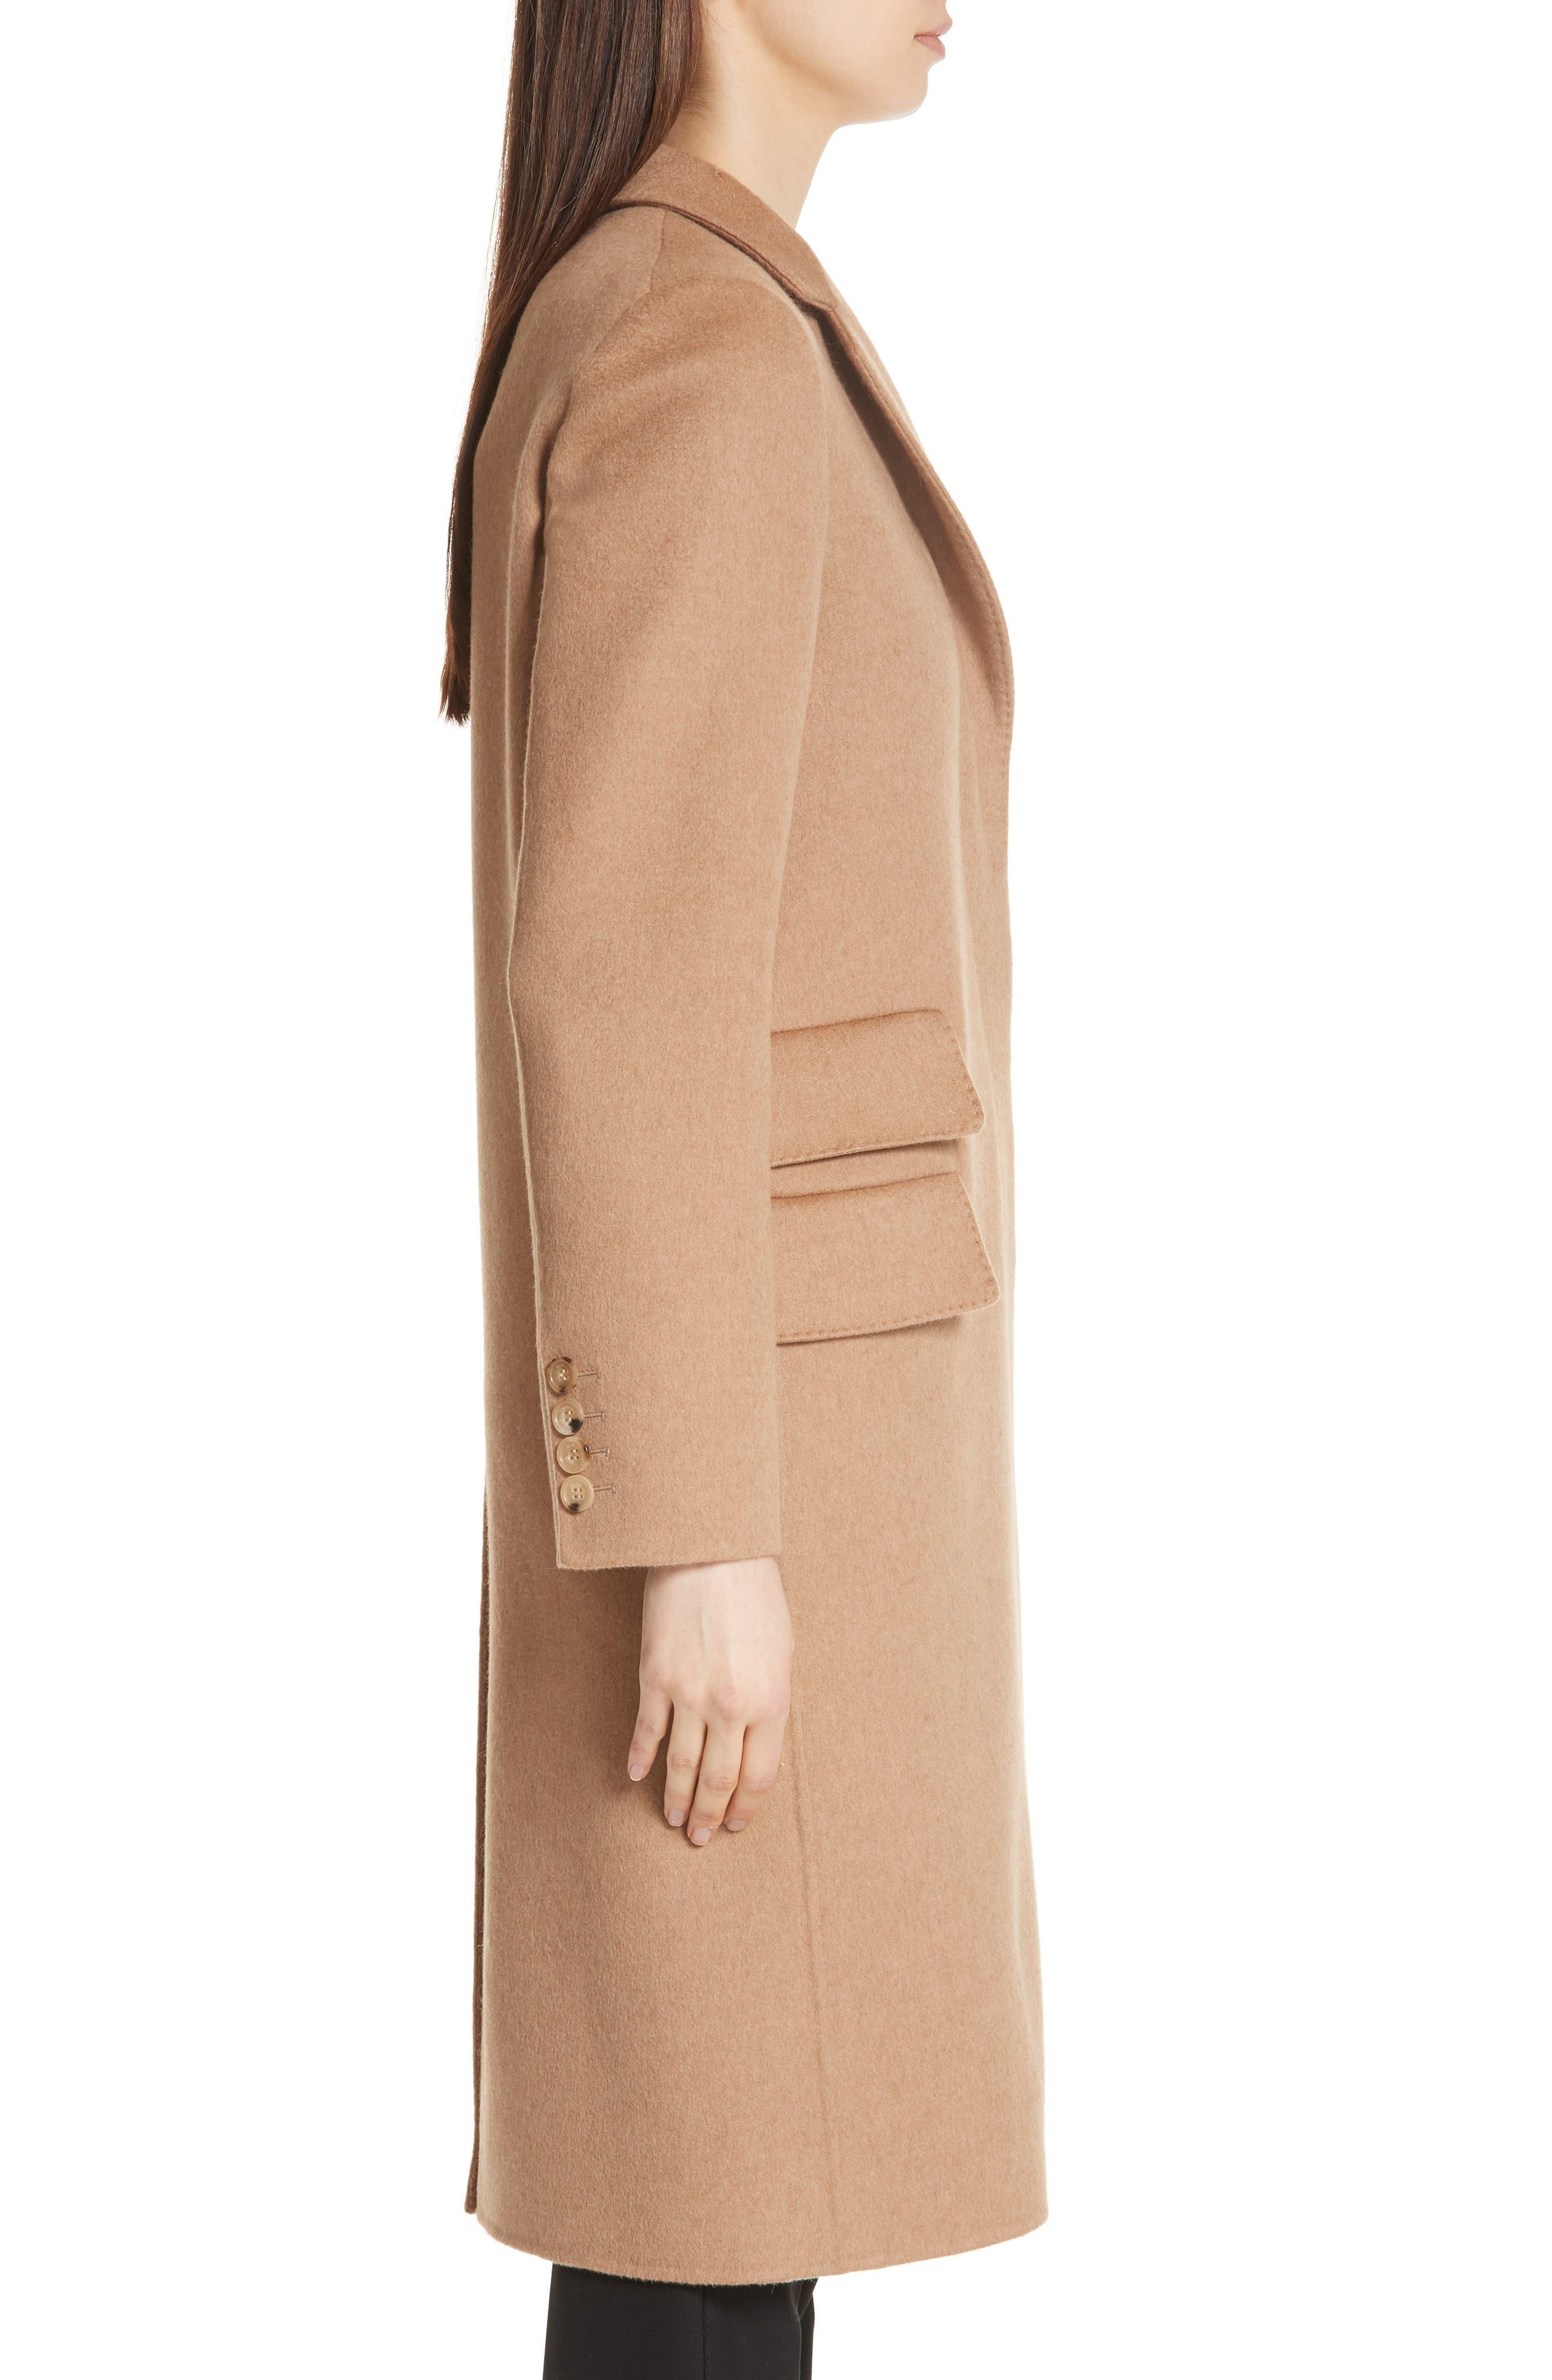 Aureo Camel Hair Coat,                             Alternate thumbnail 3, color,                             Camel